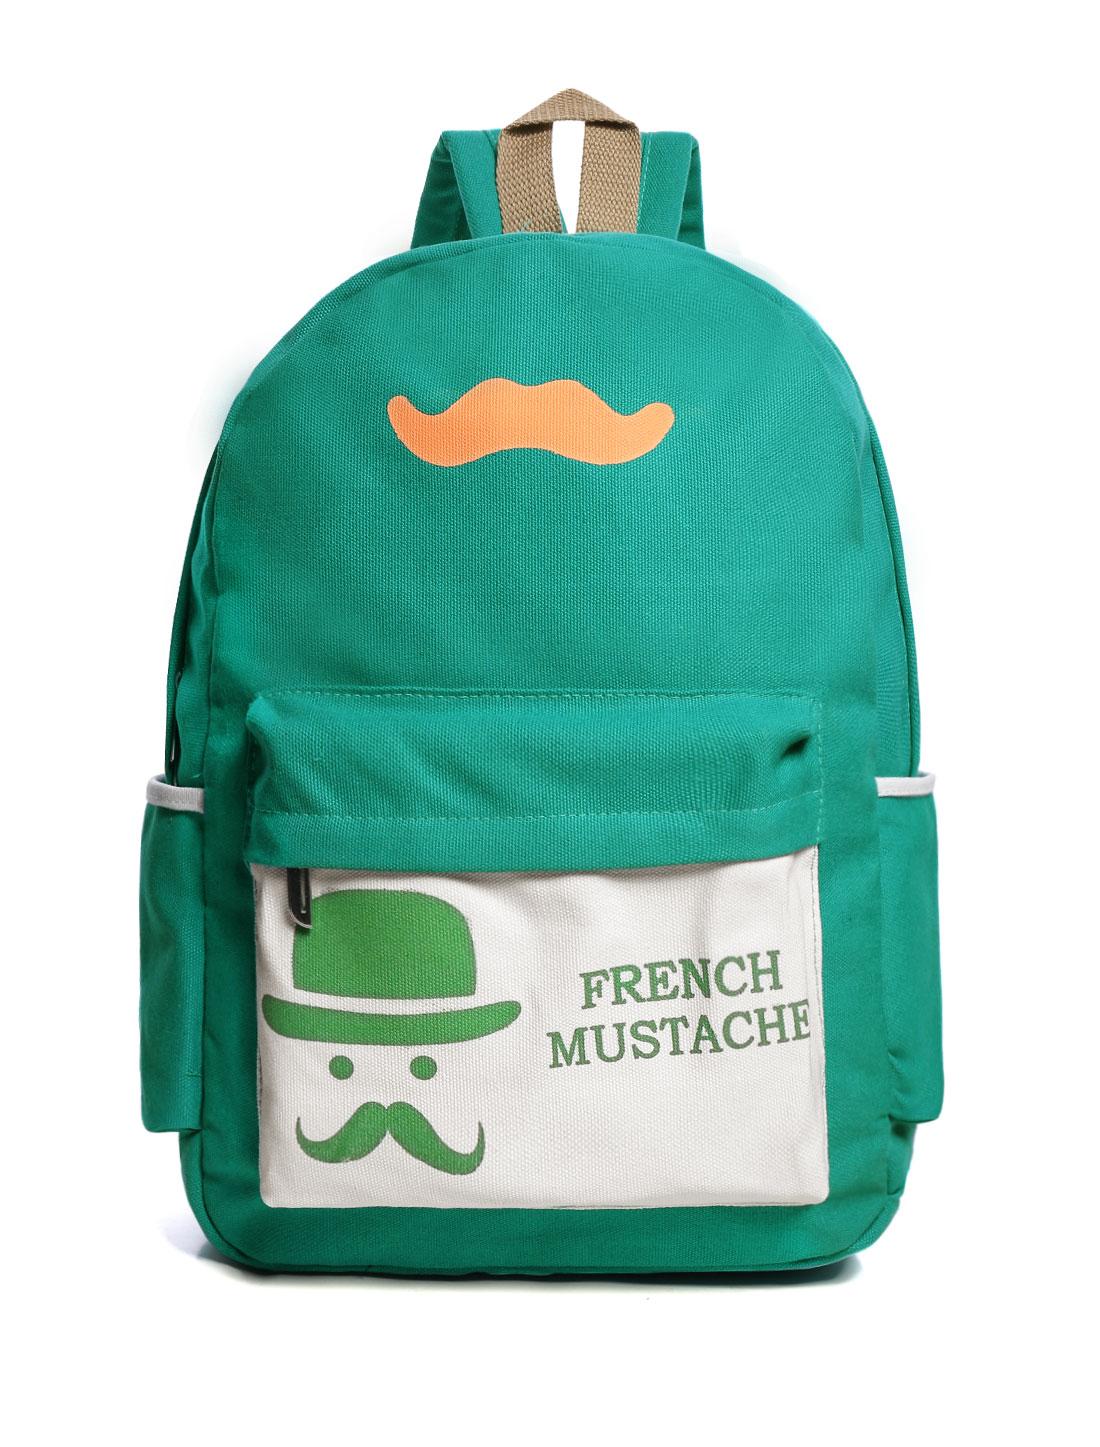 Fashion Girl Canvas Backpack School Bag Travel Rucksack Bookbags Green